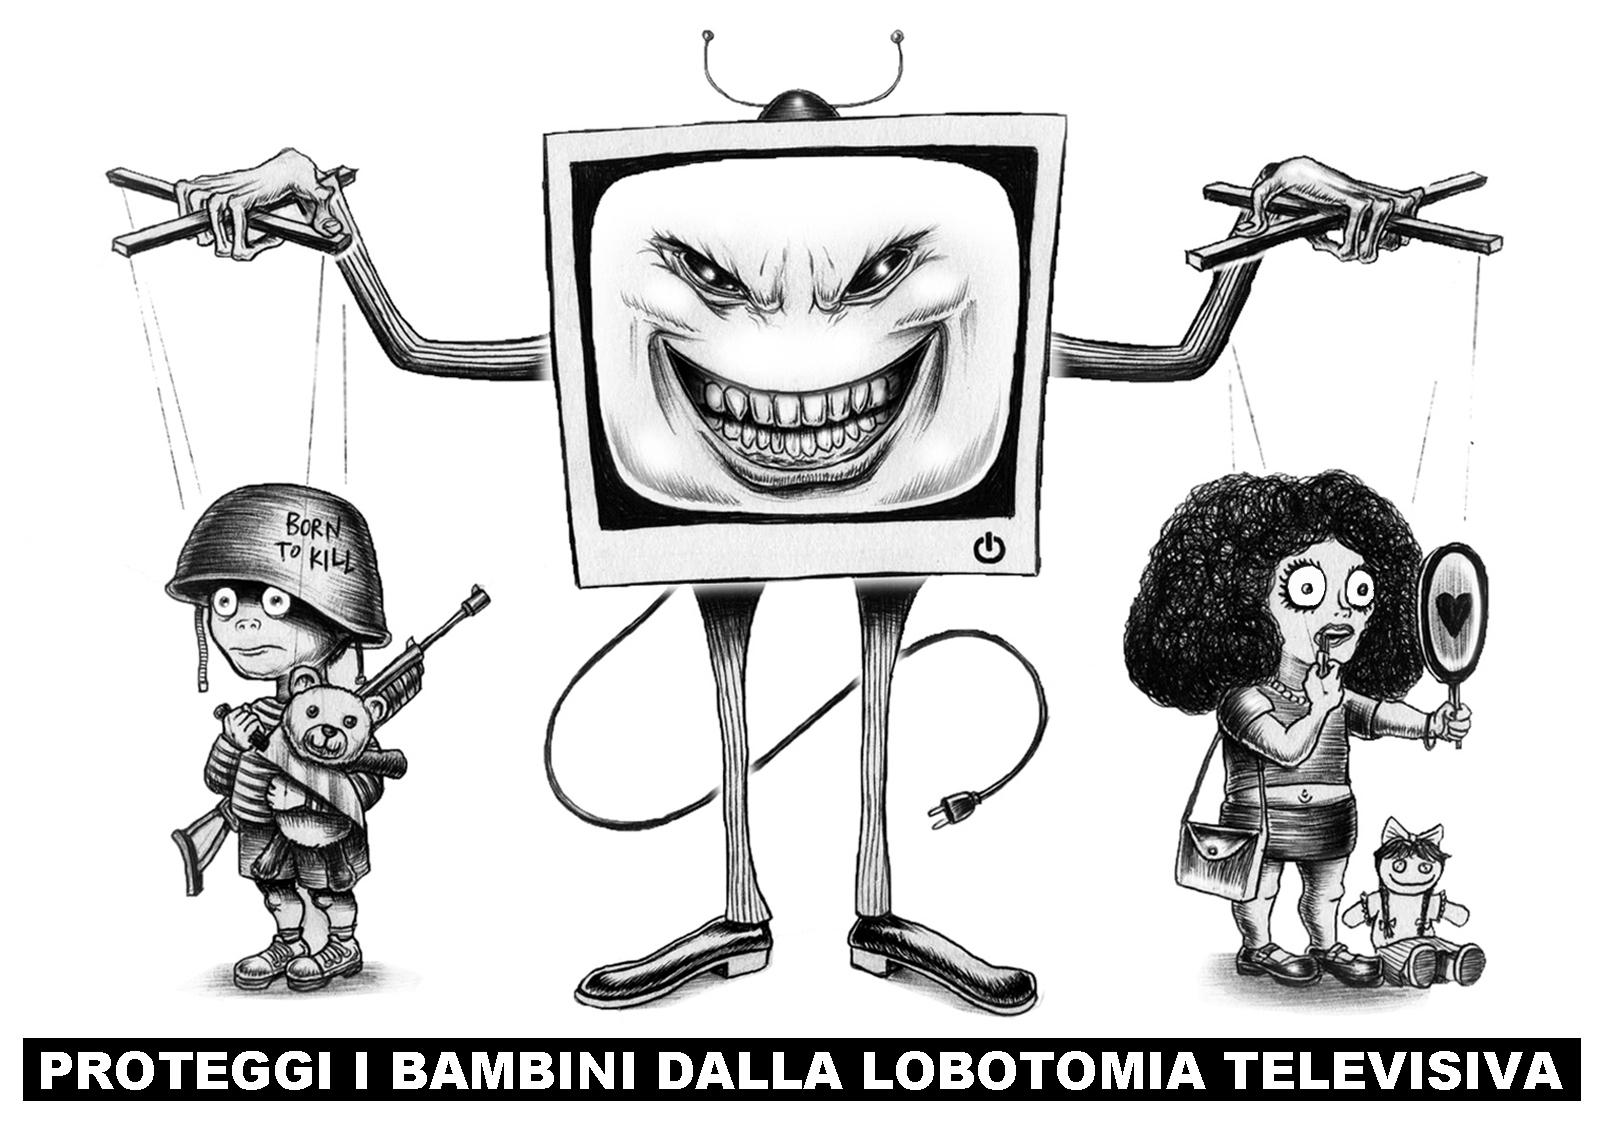 lobotomia televisiva - graficanera - NO COPYRIGHT